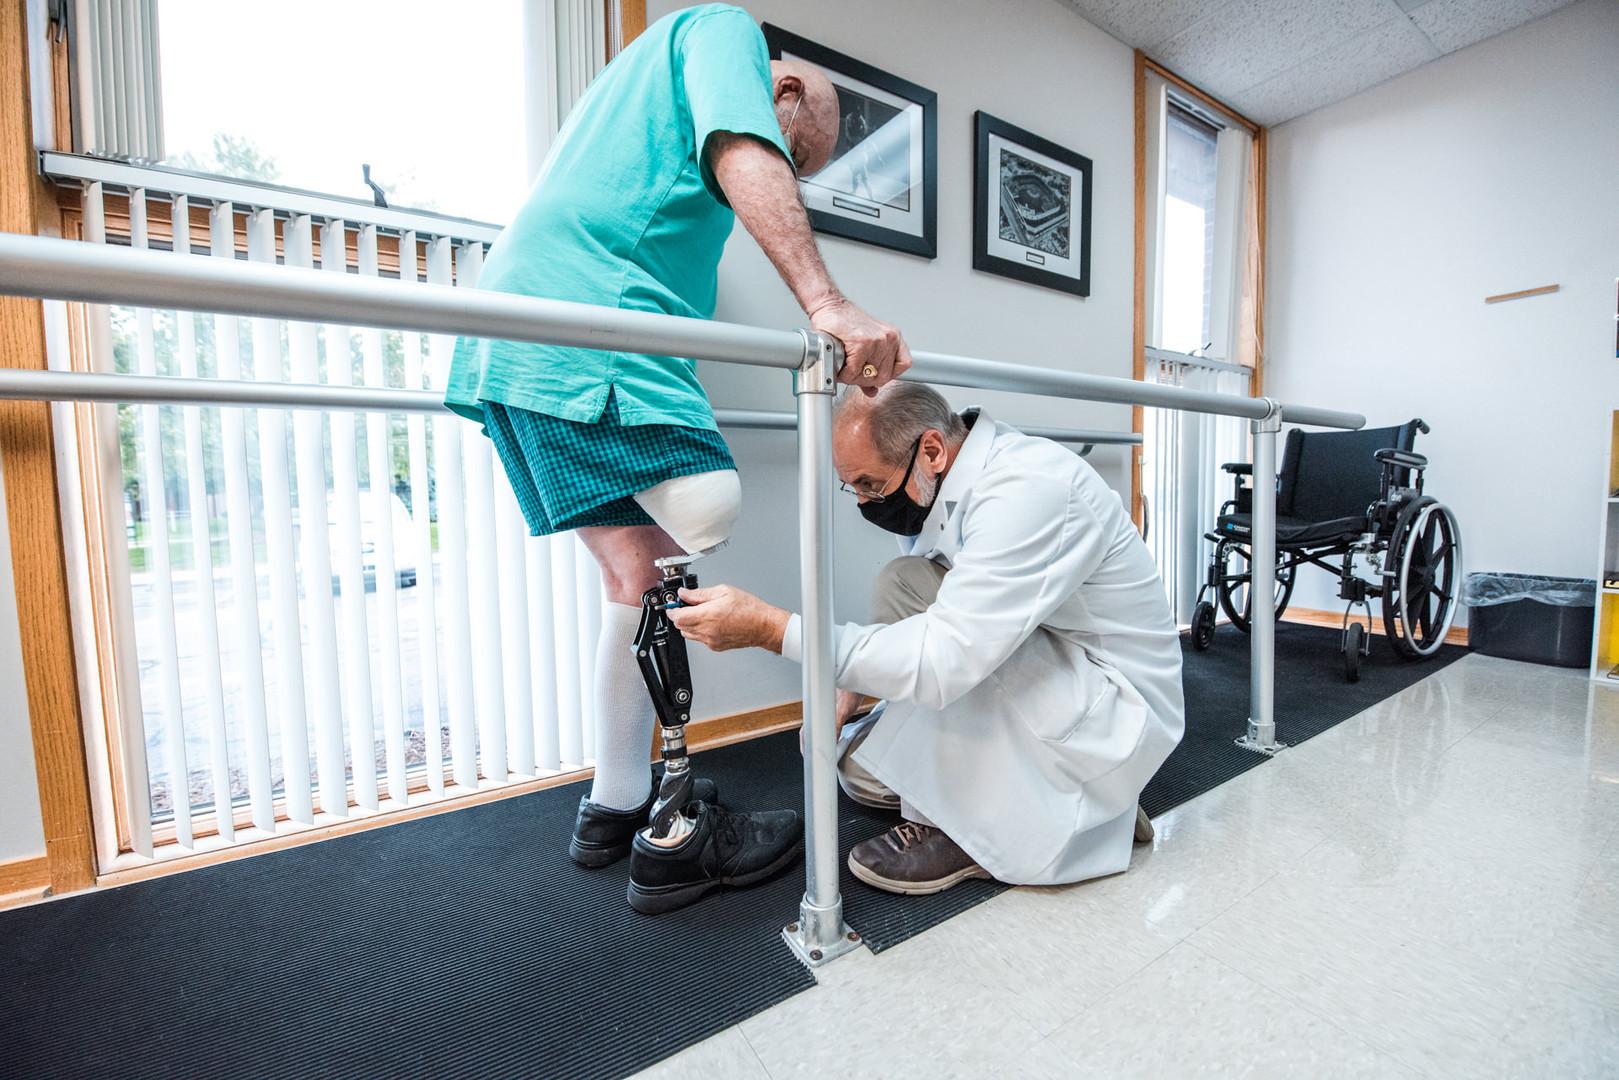 Patient Appointment - 3